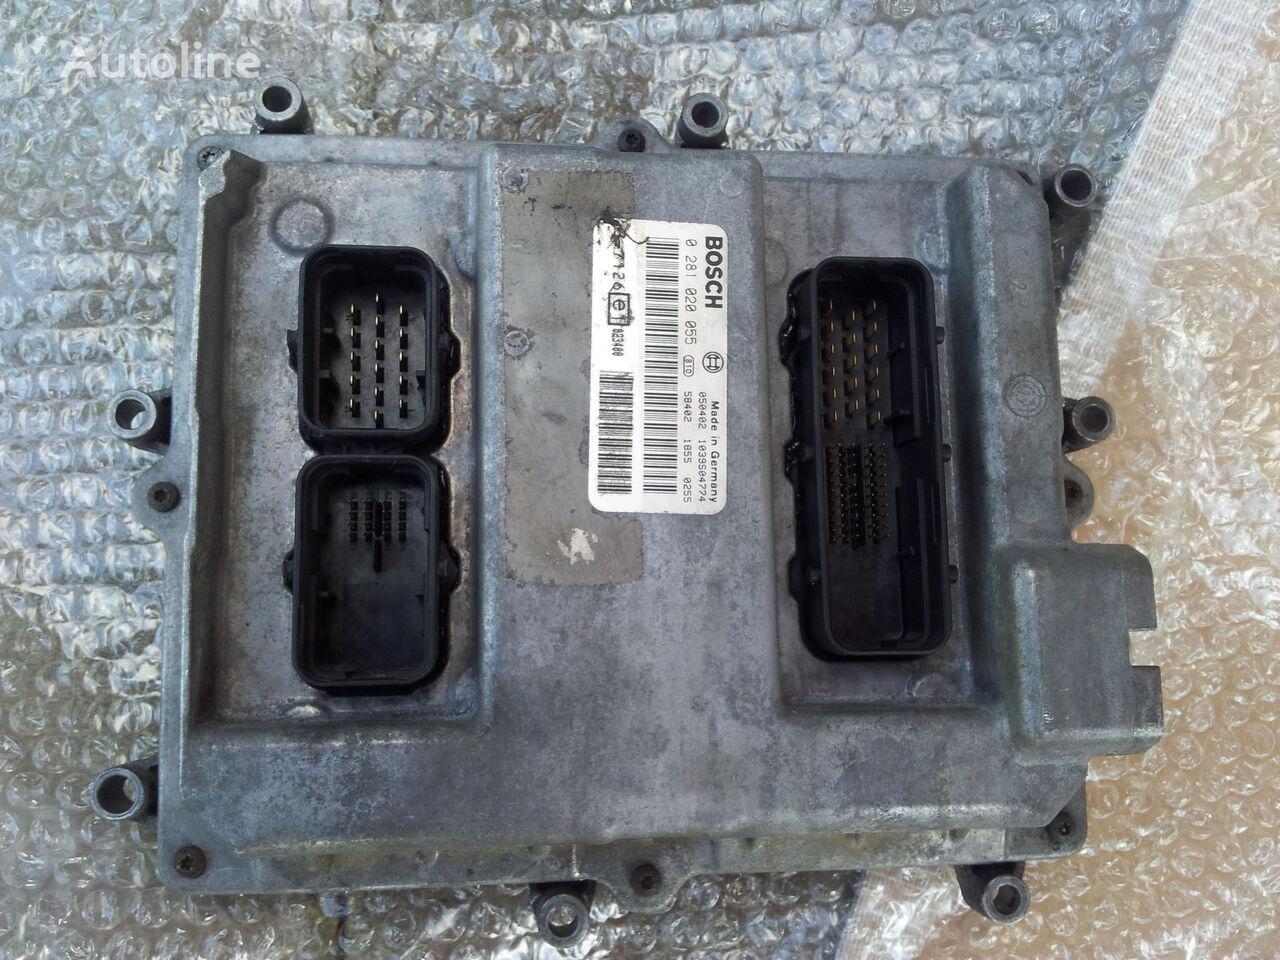 блок управления MAN Common Rail EDC, ECU electronic diesel control 0281020055, D2066 для тягача MAN TGA